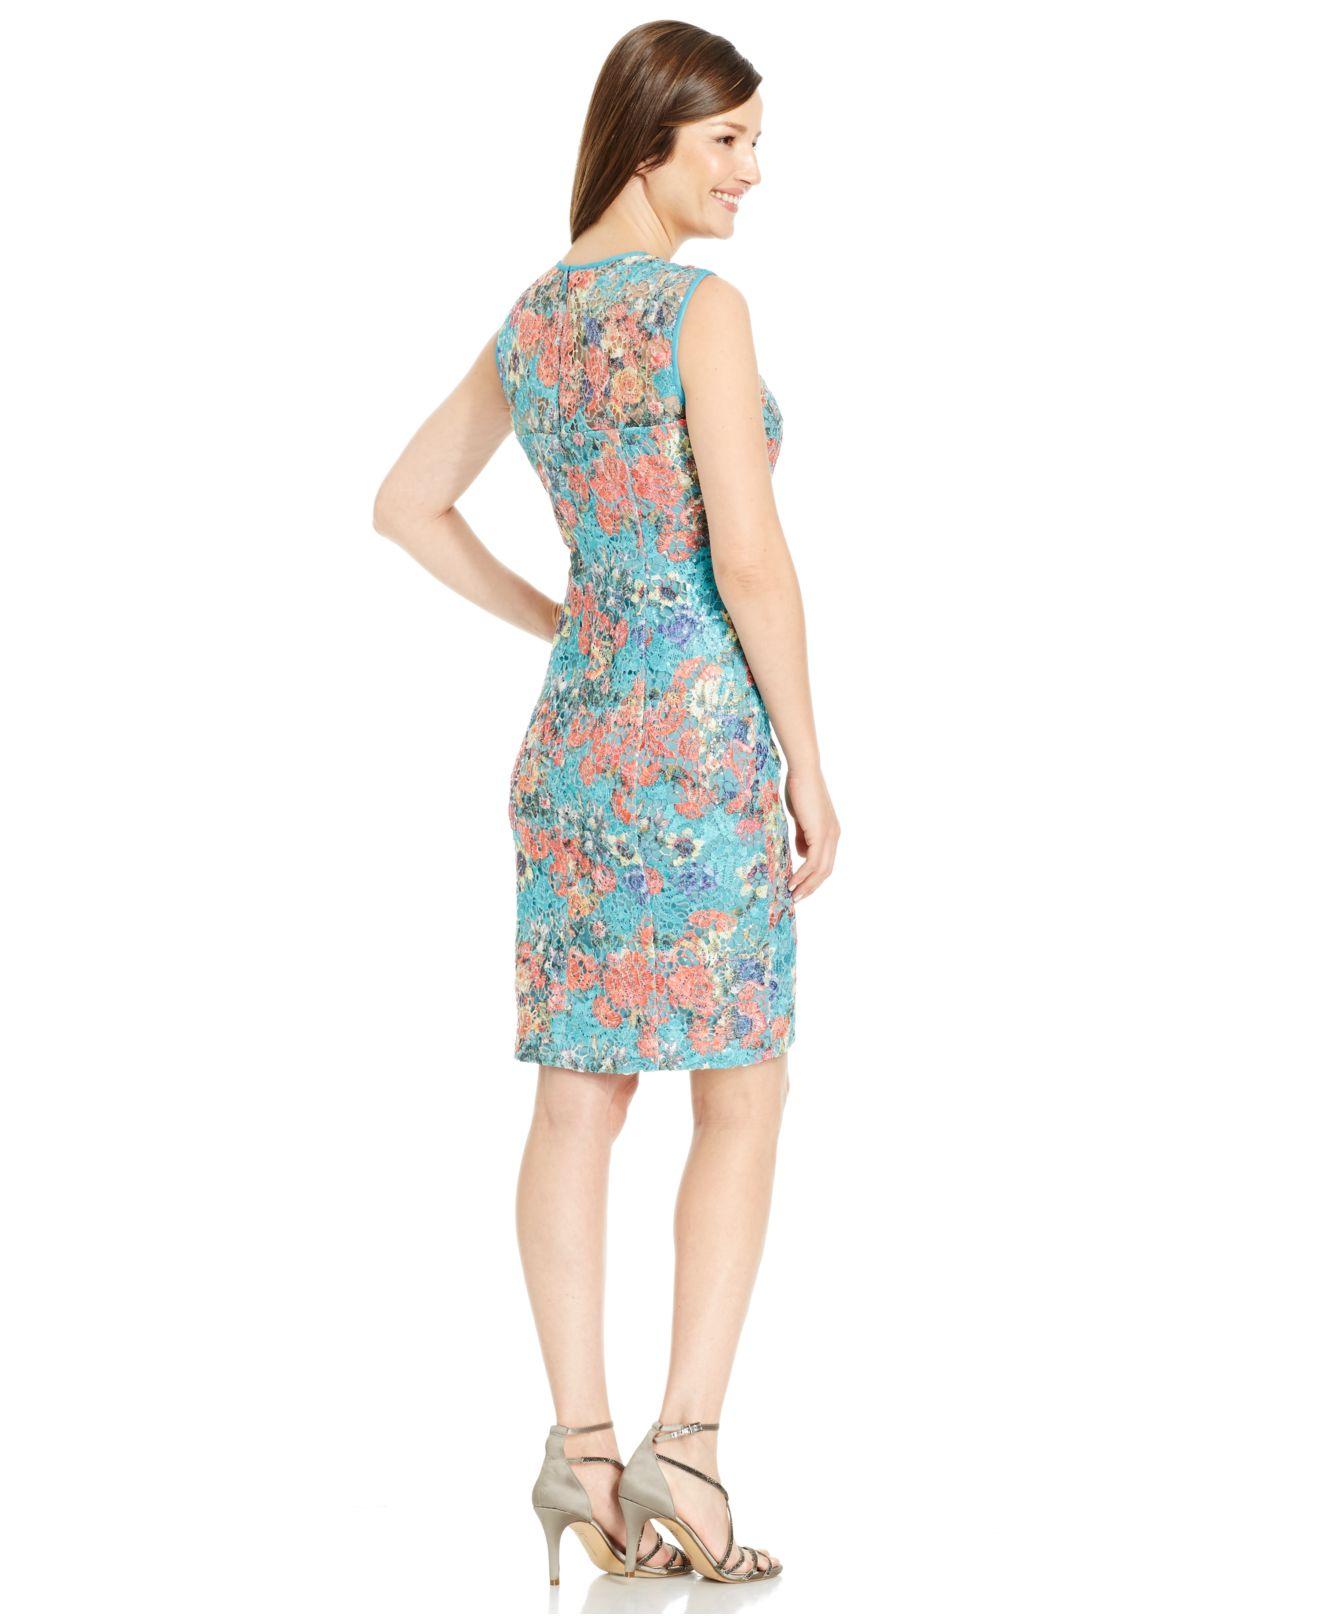 Turquoise Lace Sheath Dress